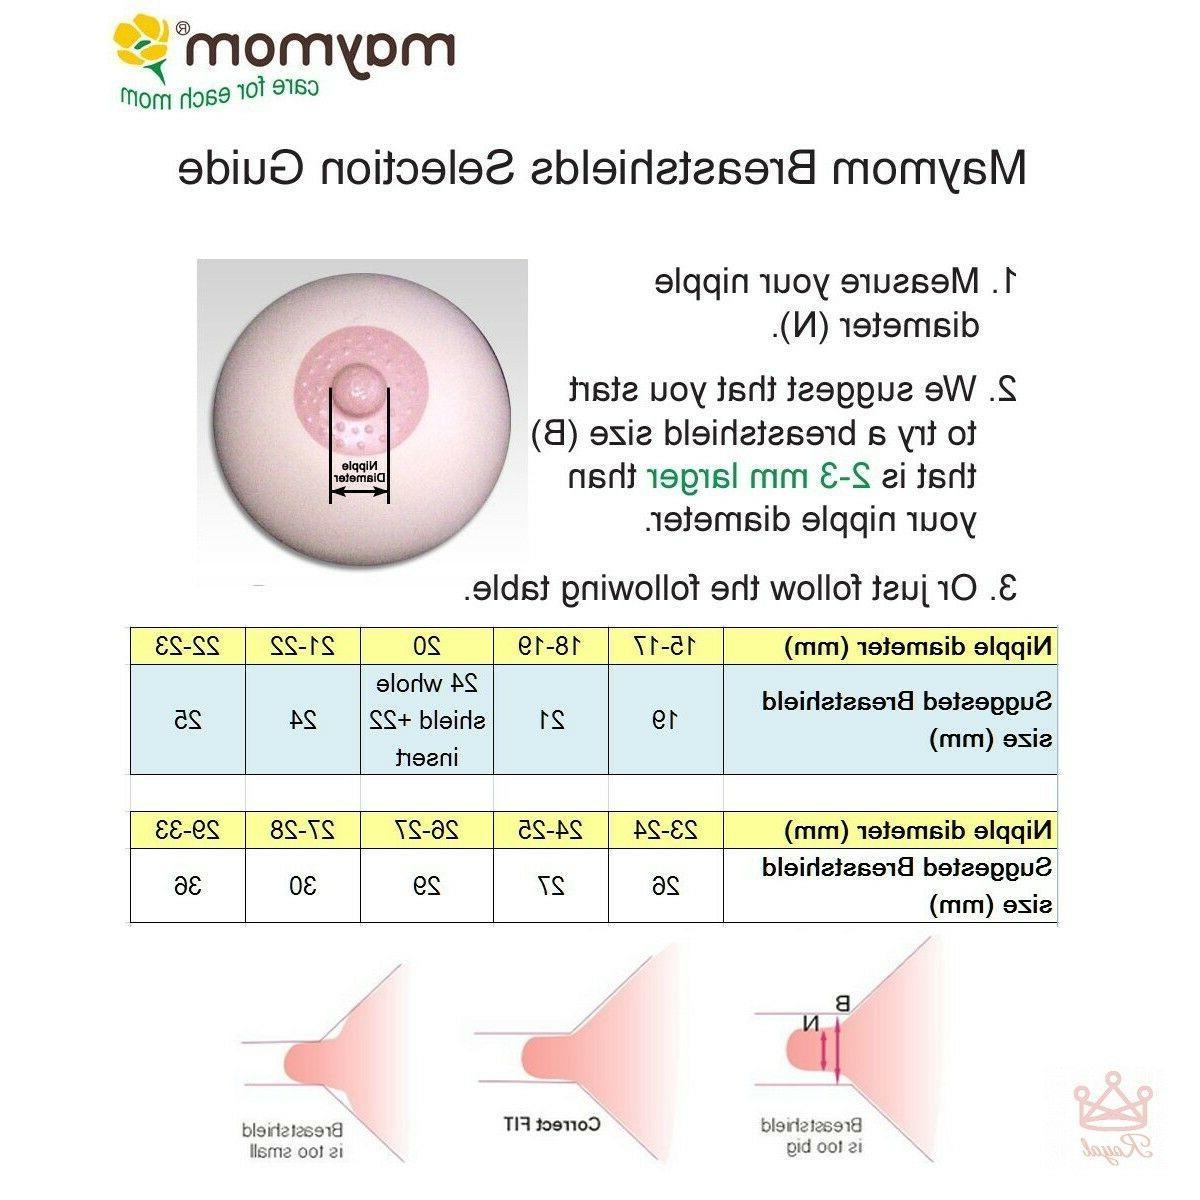 Handsfree Breastpump Breastfeeding Medela Freestyle Milk